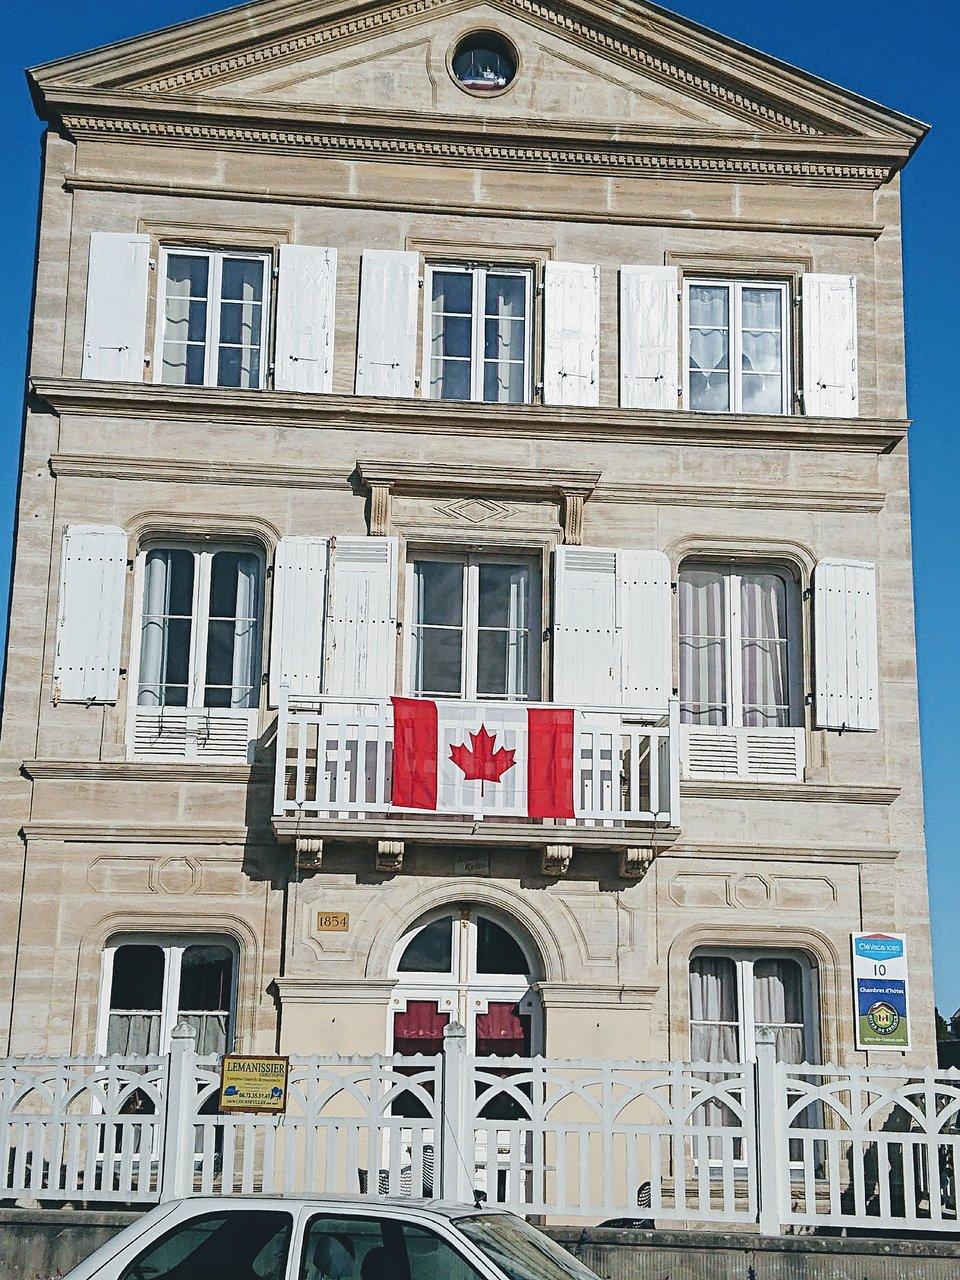 Anais Y Lili joyeux reveil $89 ($̶1̶0̶1̶) - prices & specialty inn